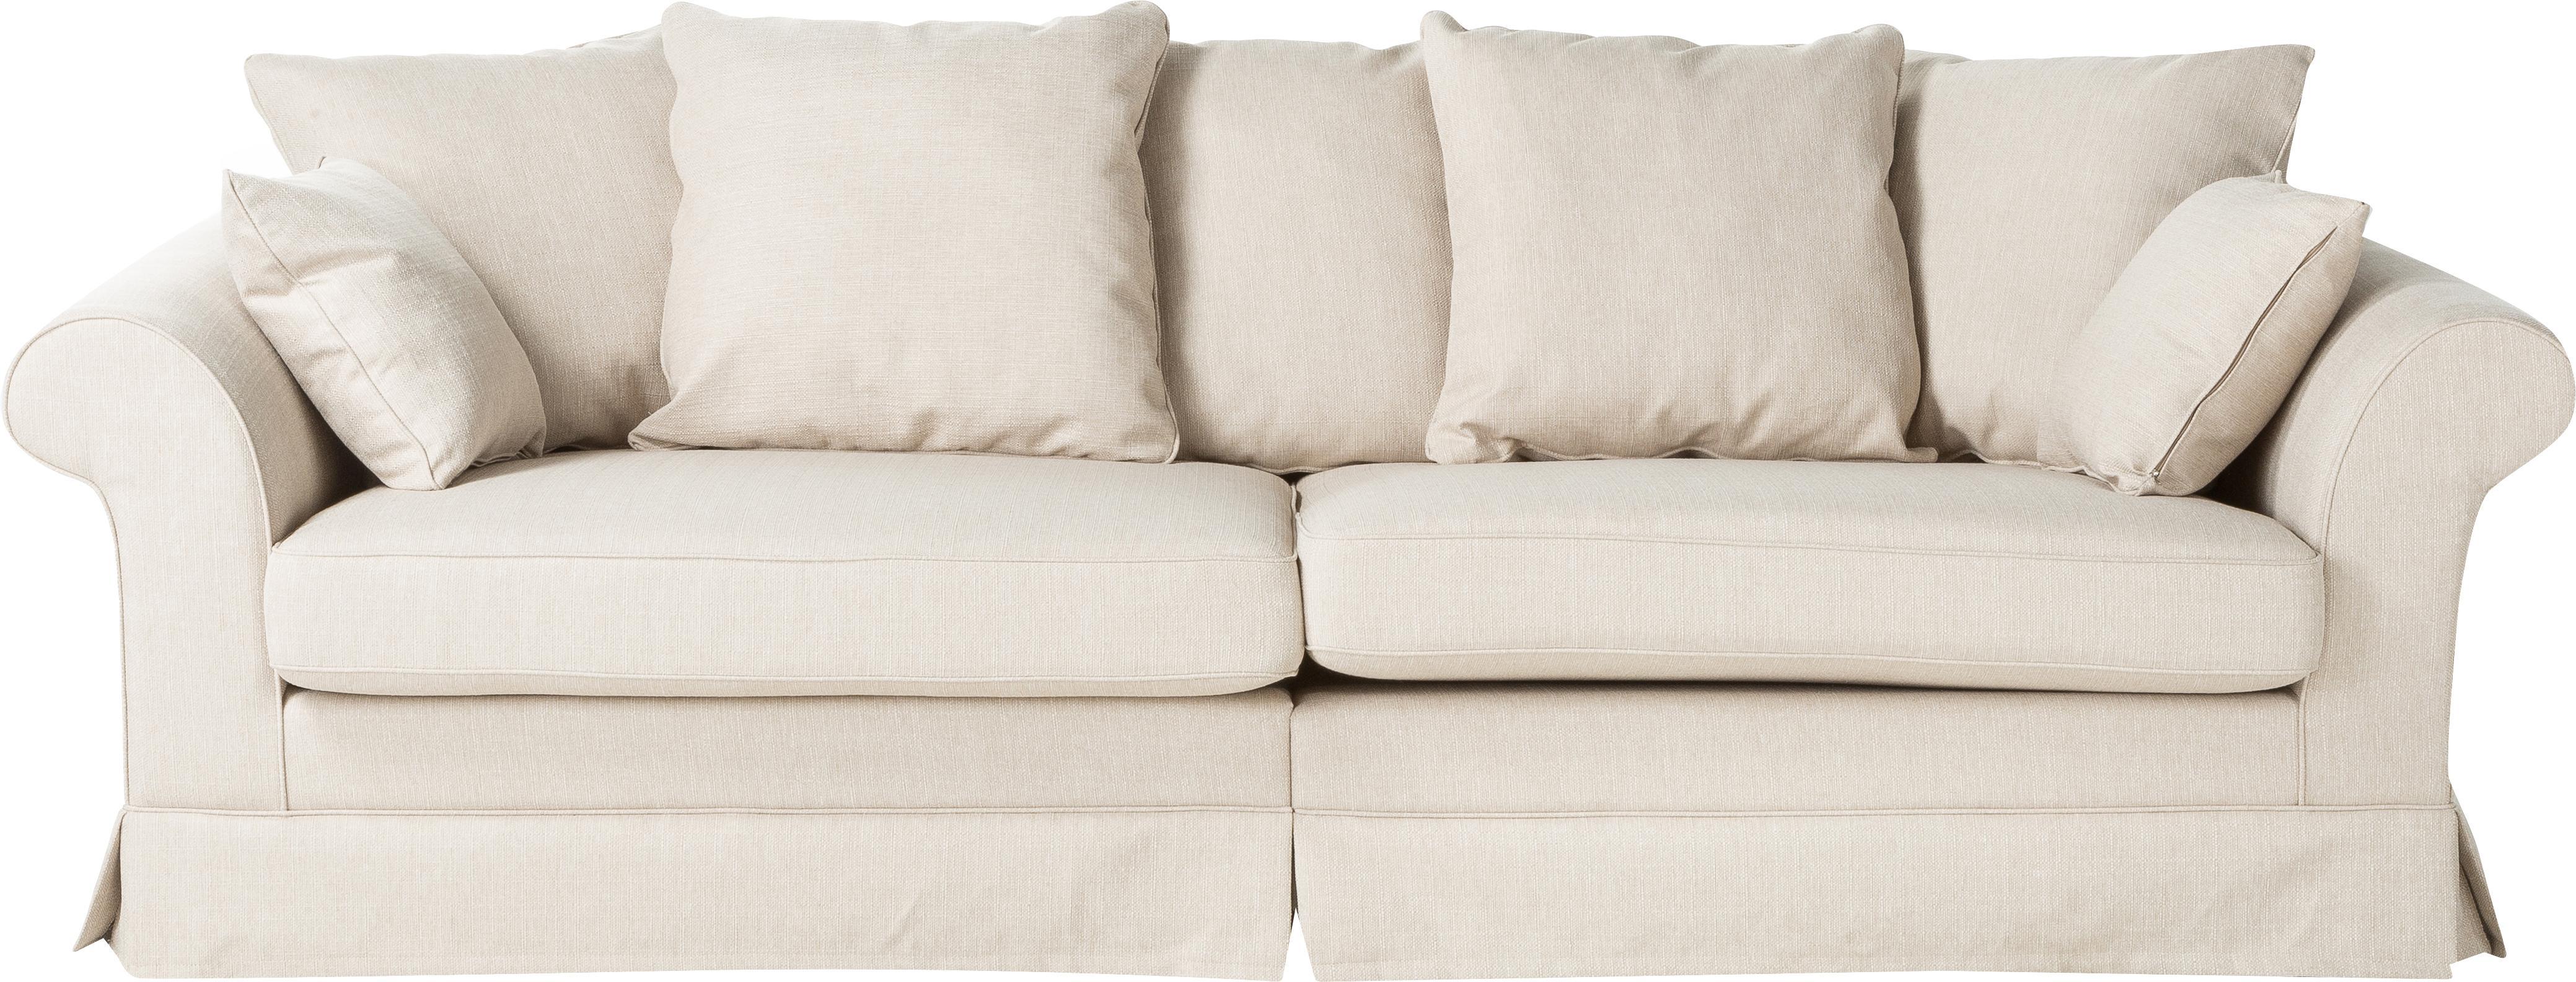 Hussen-Sofa Nobis, Bezug: Polyester, Webstoff Creme, B 264 x T 111 cm